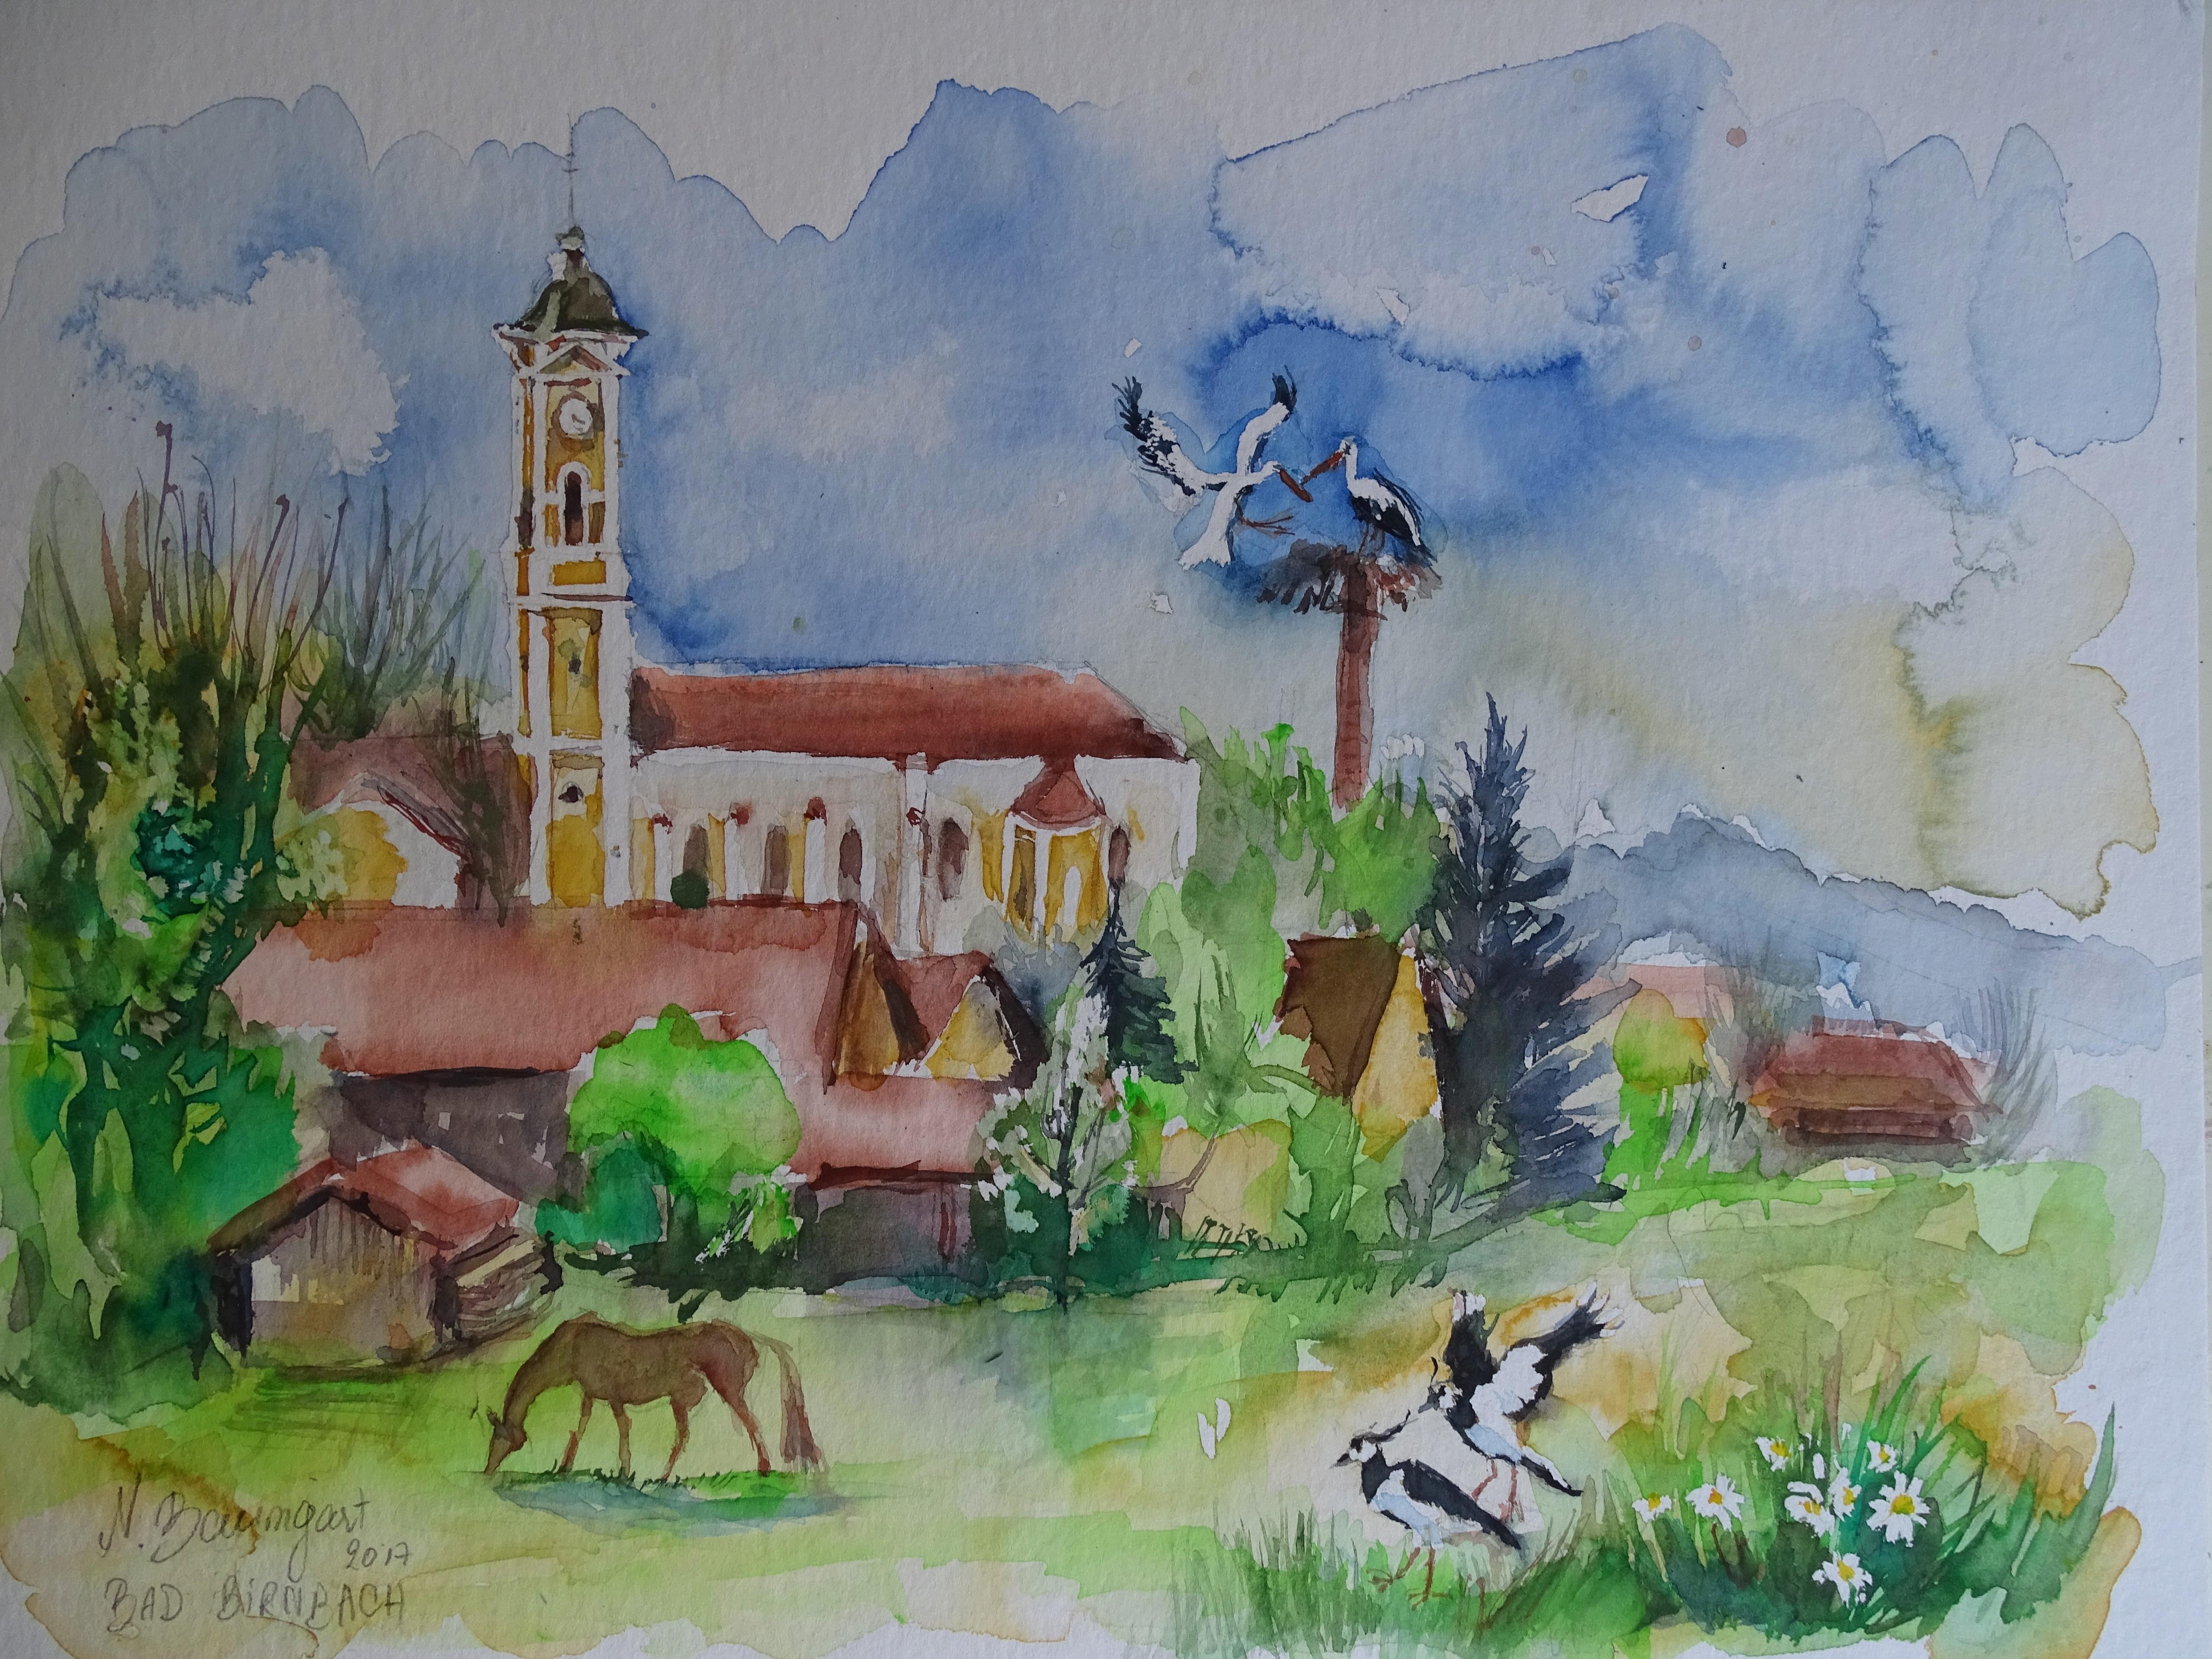 Aquarelle-Bad-Birnbach-Stoerche-Nadia-Baumgart